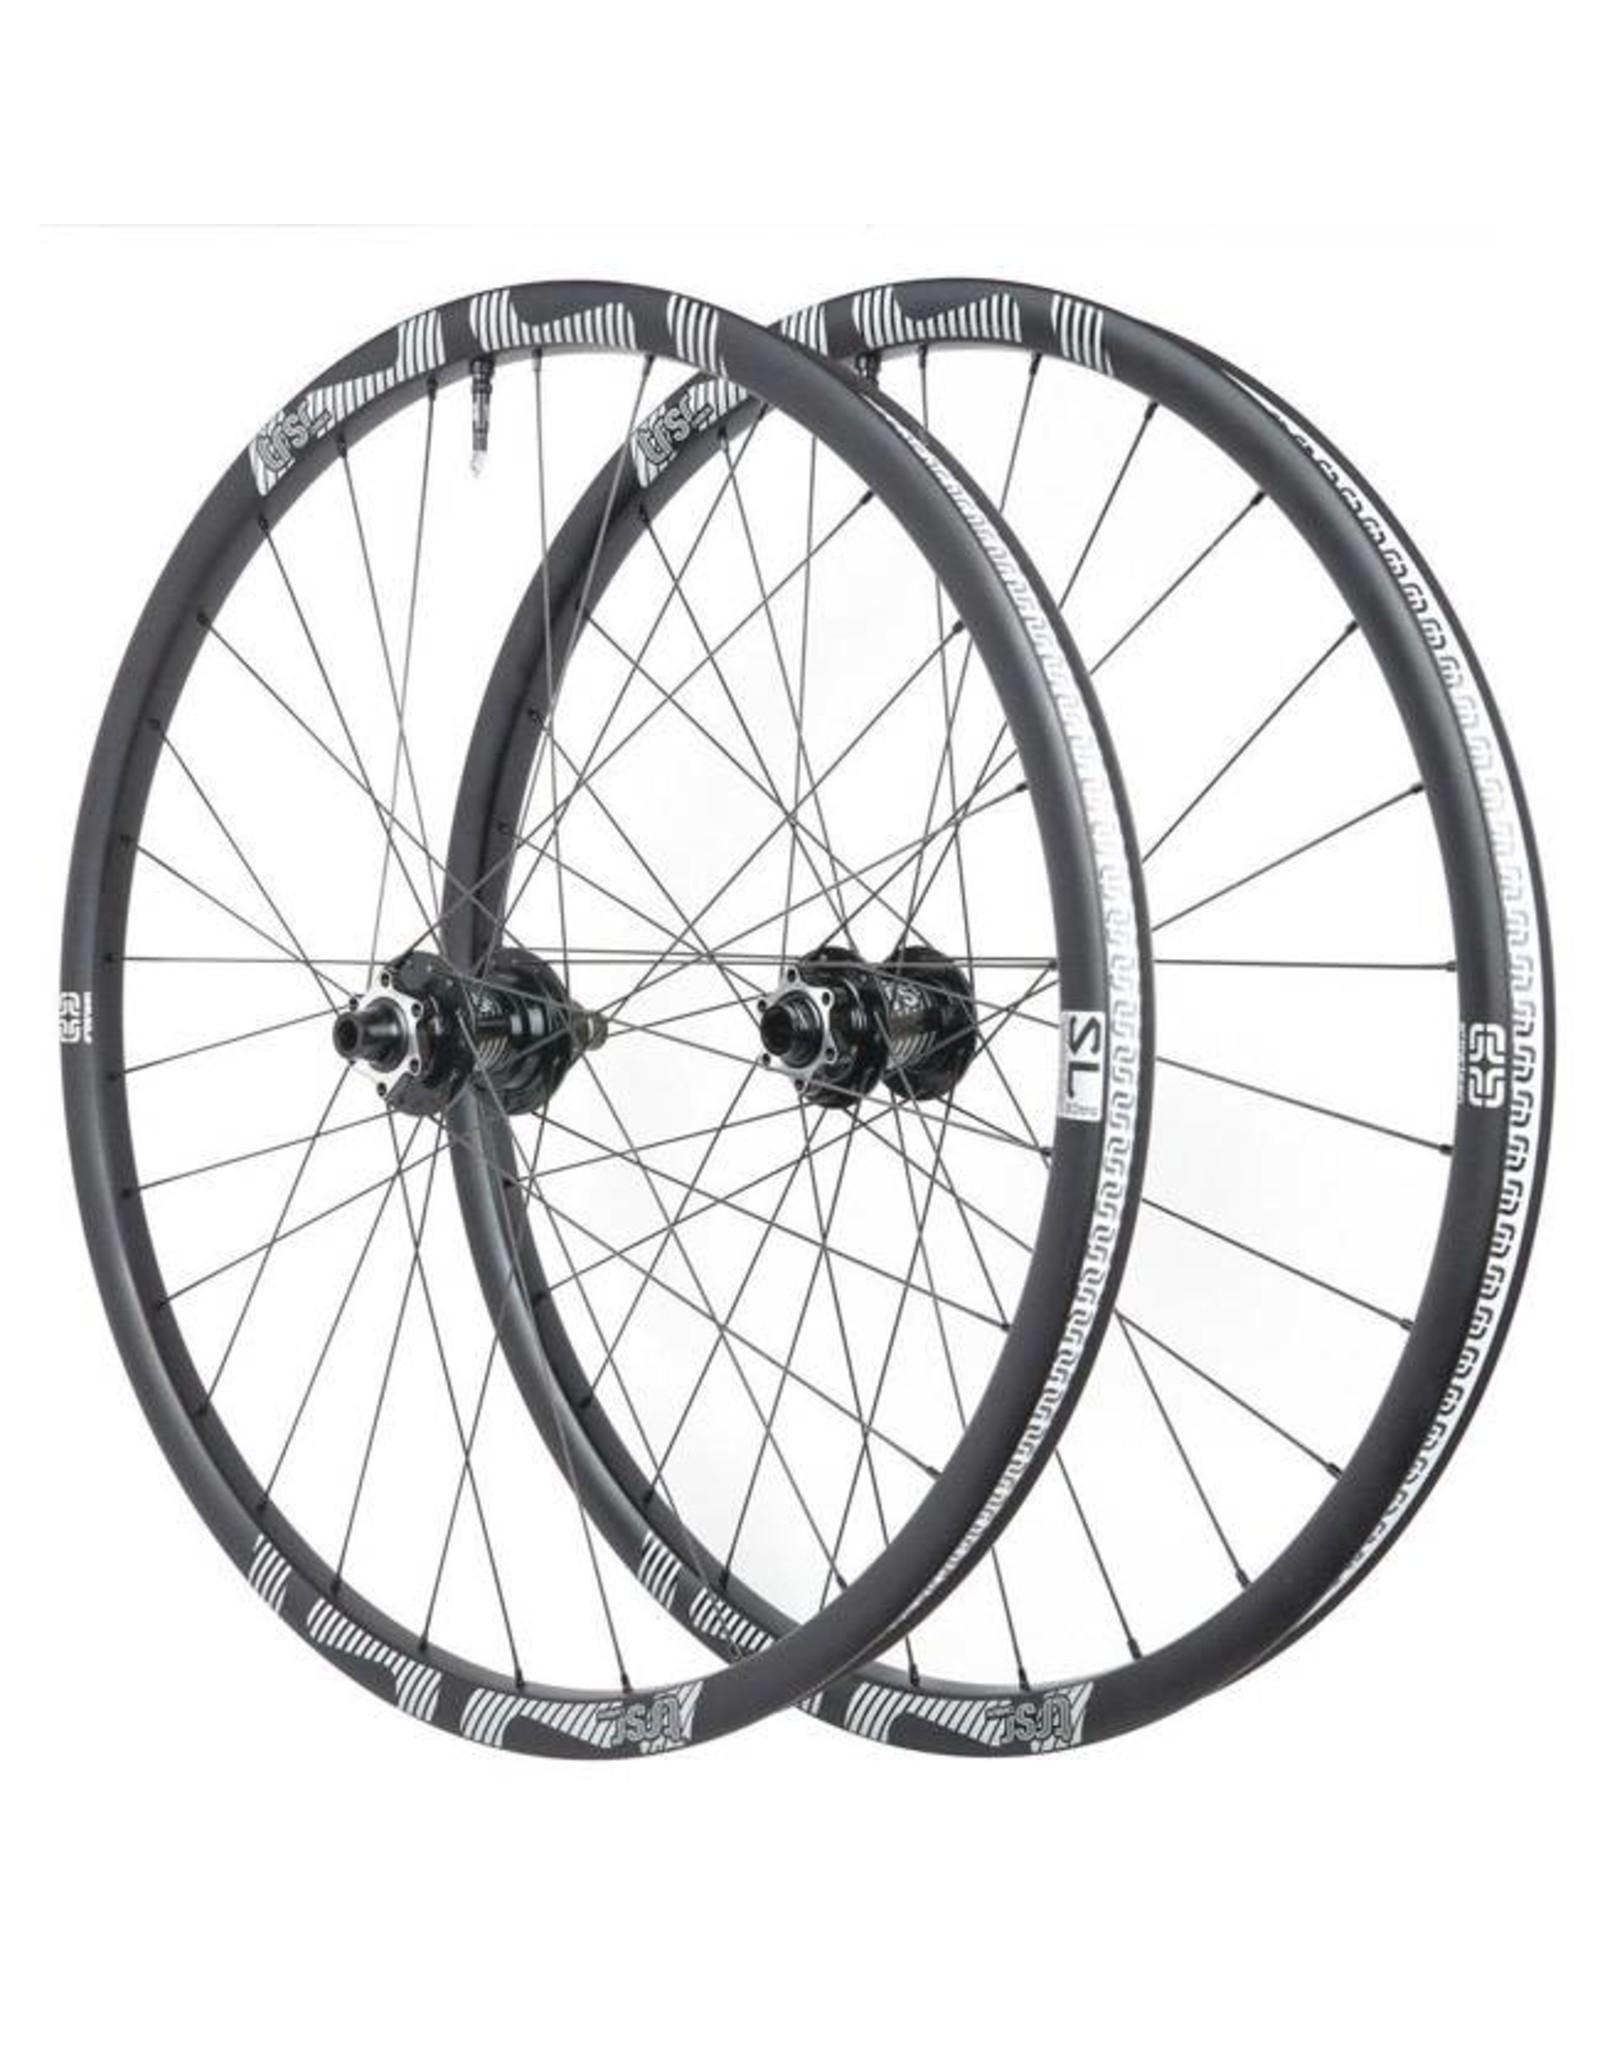 "e*thirteen by The Hive e*thirteen TRSr SL Front Wheel 29"" 110x15mm Boost Tubeless, Black"